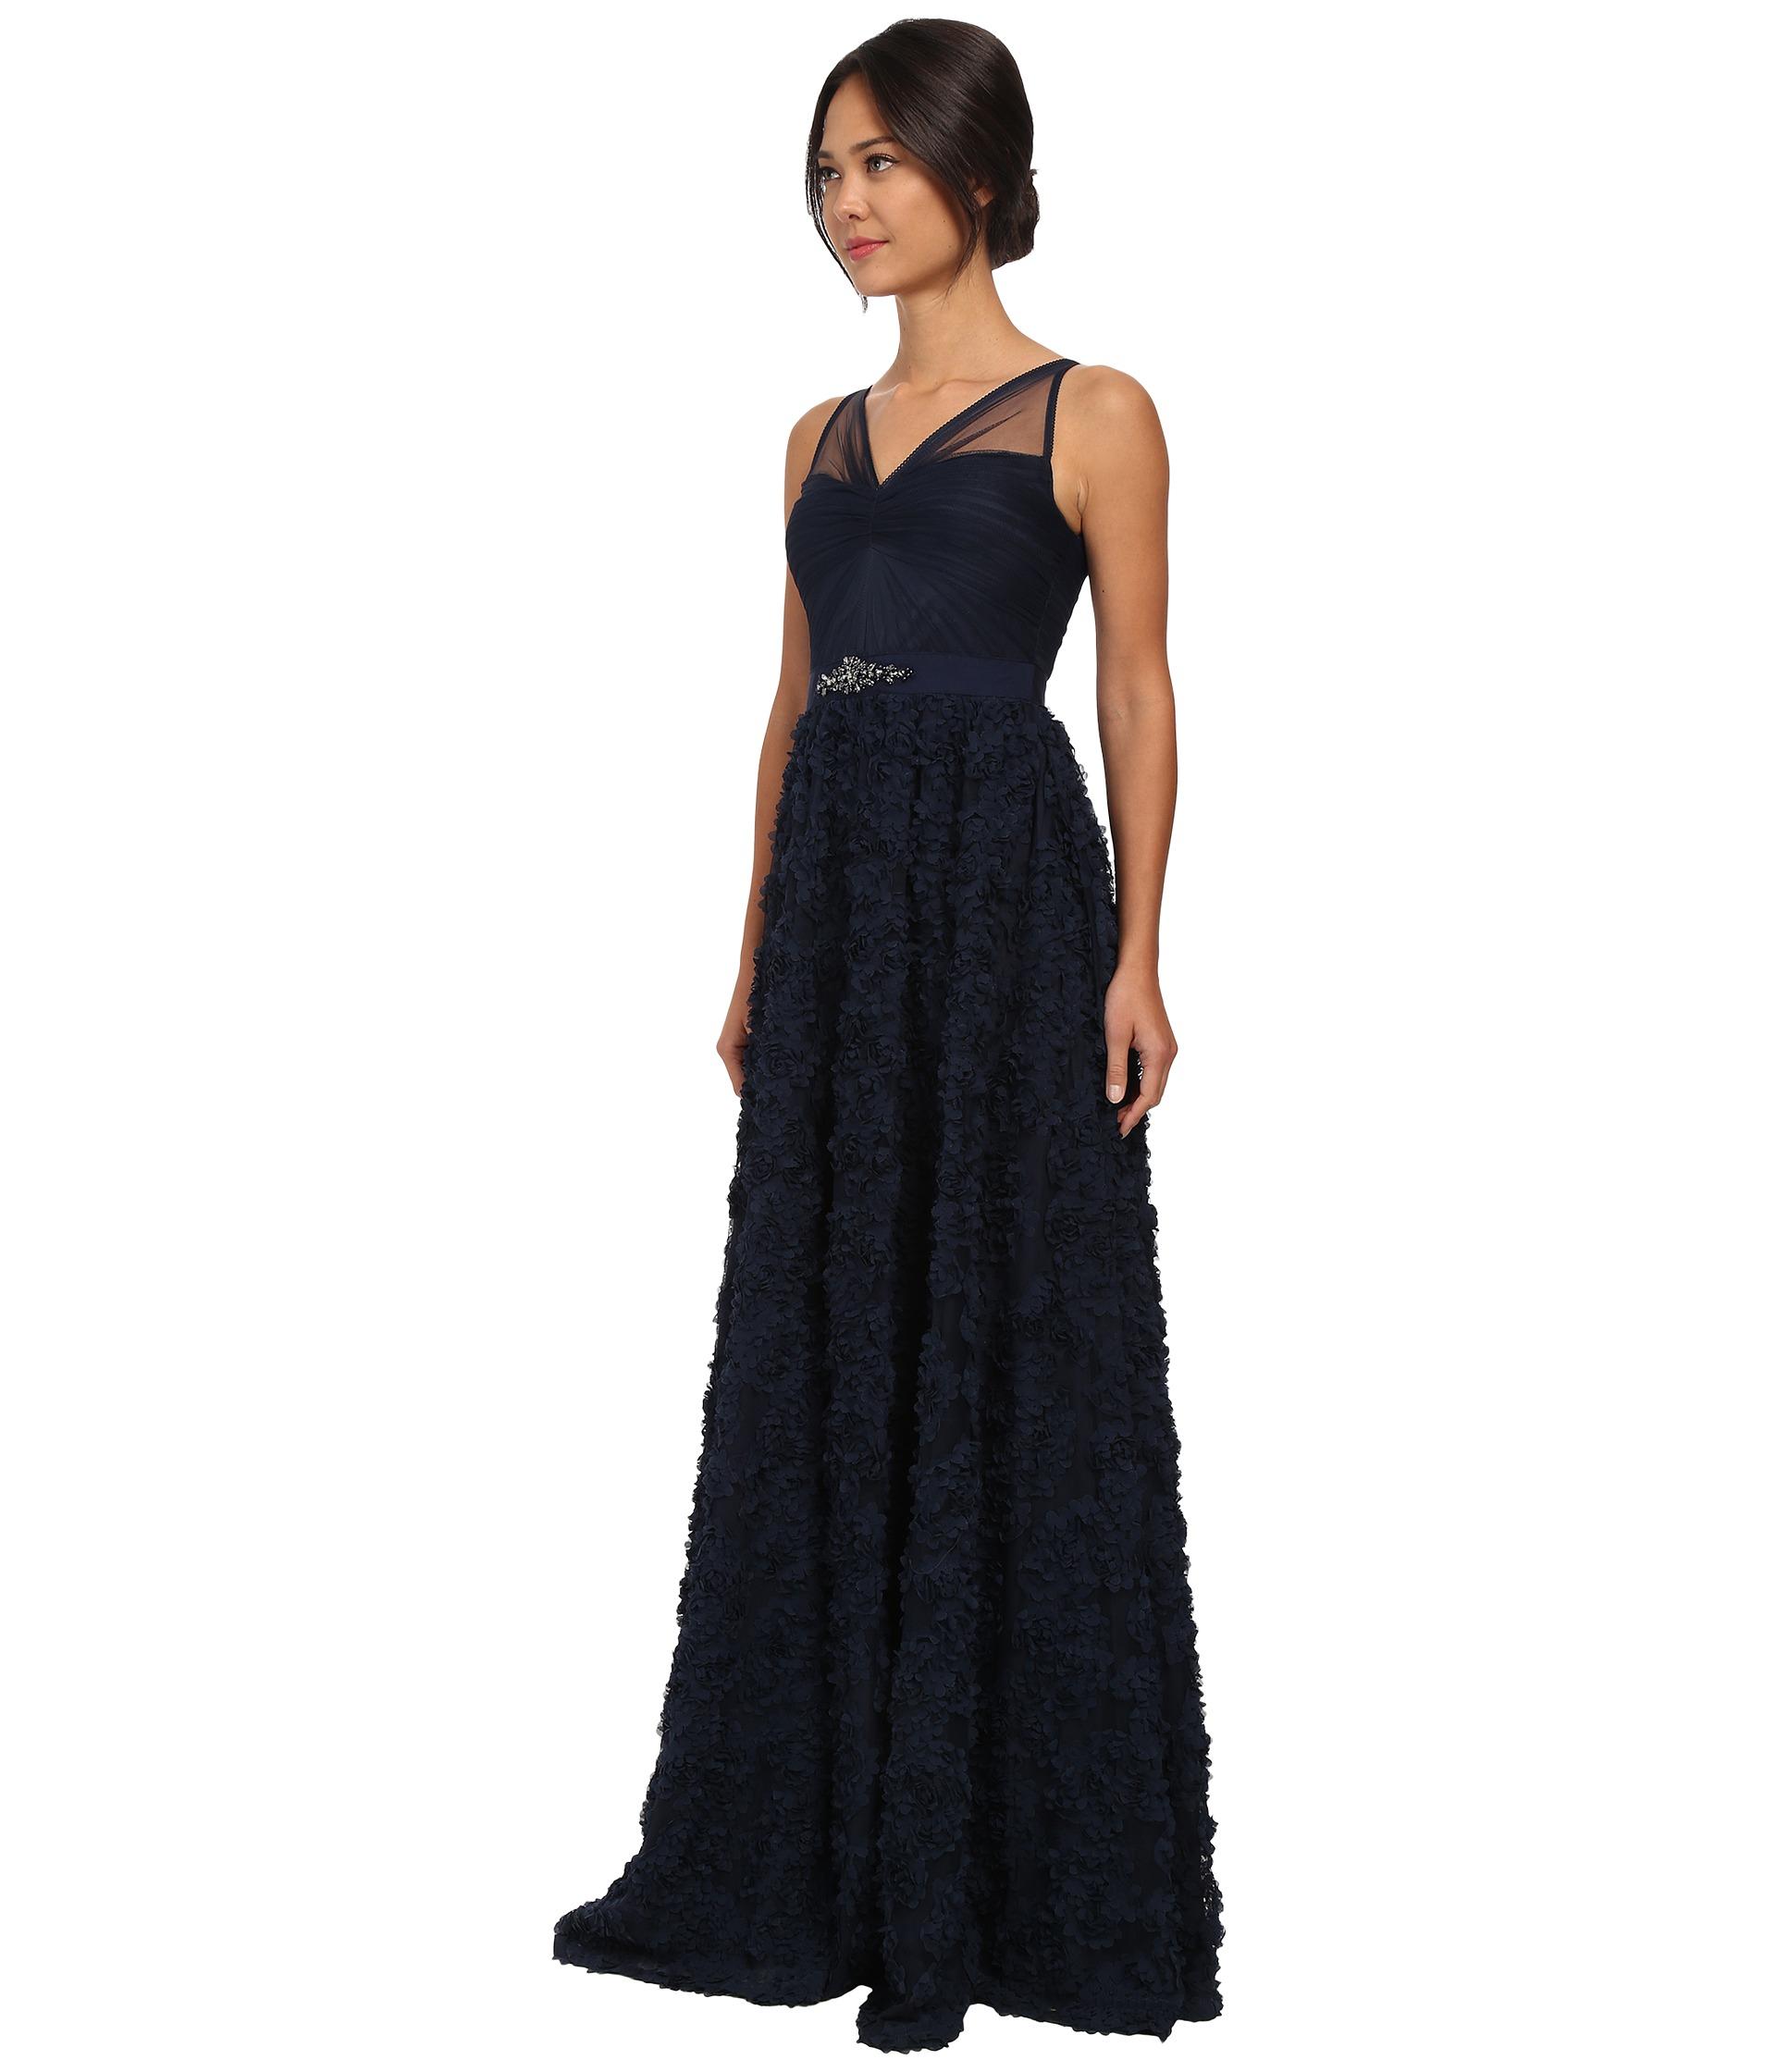 a0975226e68b Adrianna Papell Sleeveless Tulle Chiffon Petal Ballgown in Blue - Lyst